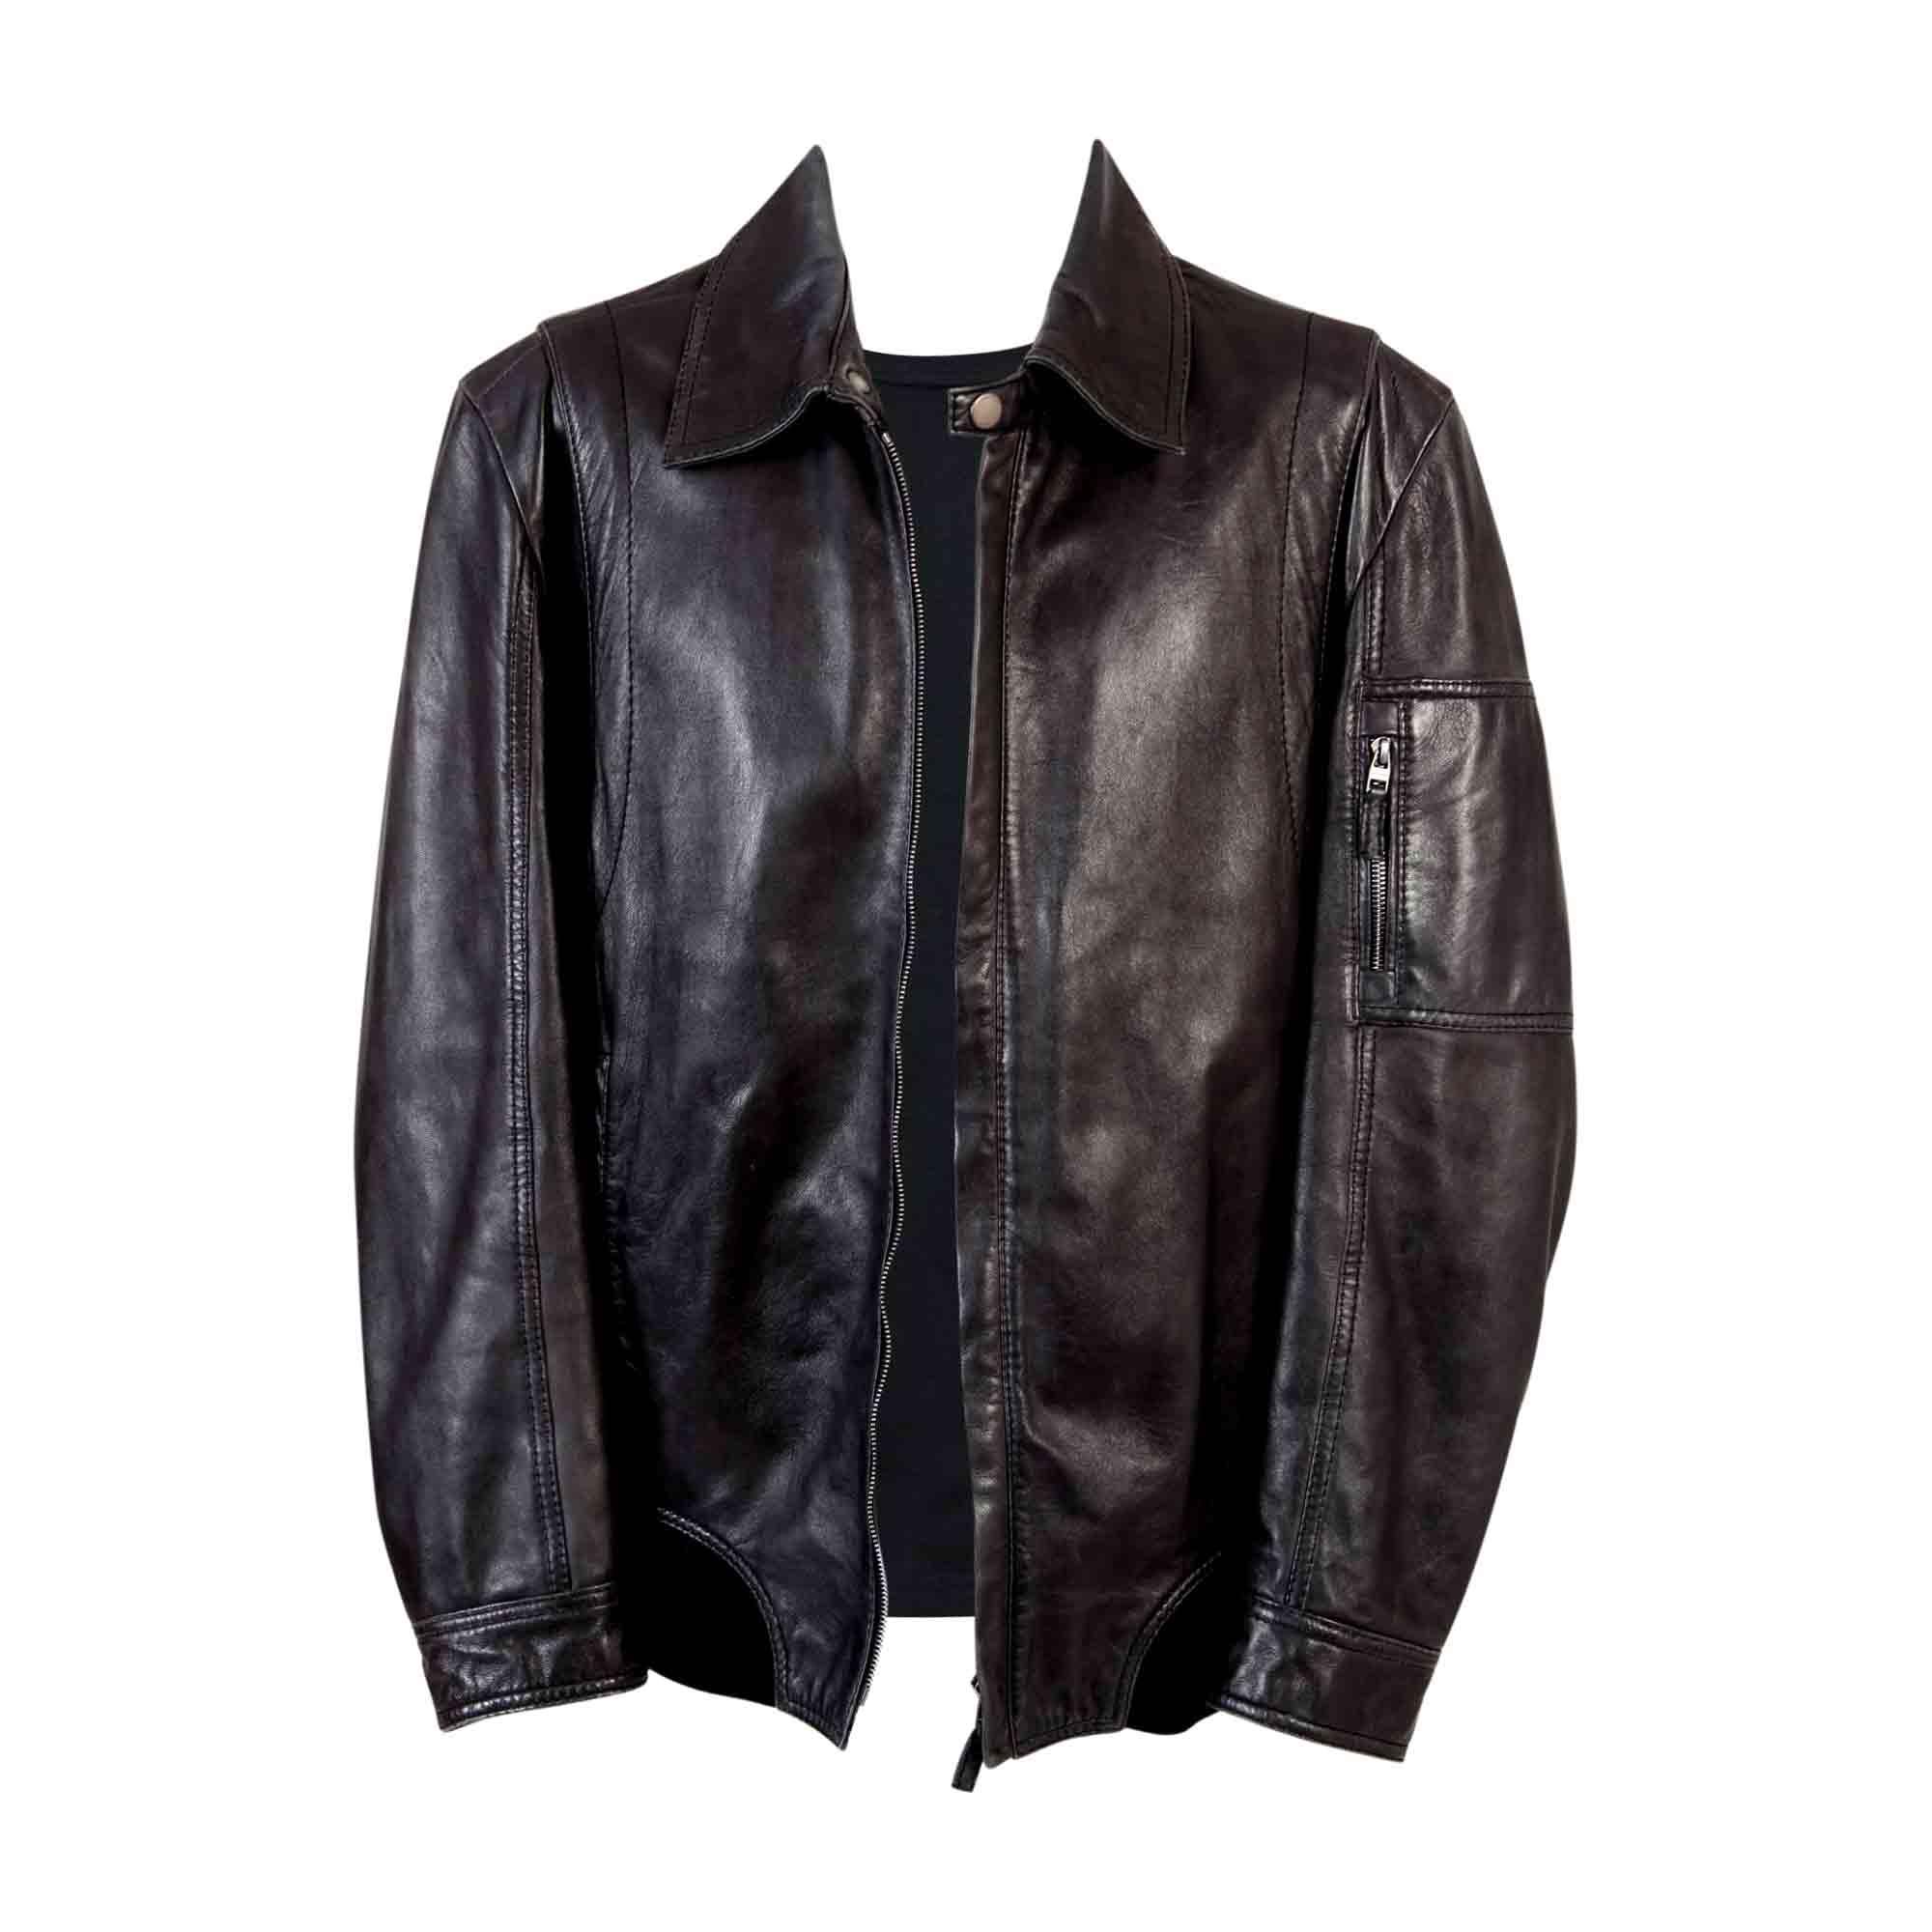 Blouson en cuir HUGO BOSS 56 (XL) noir vendu